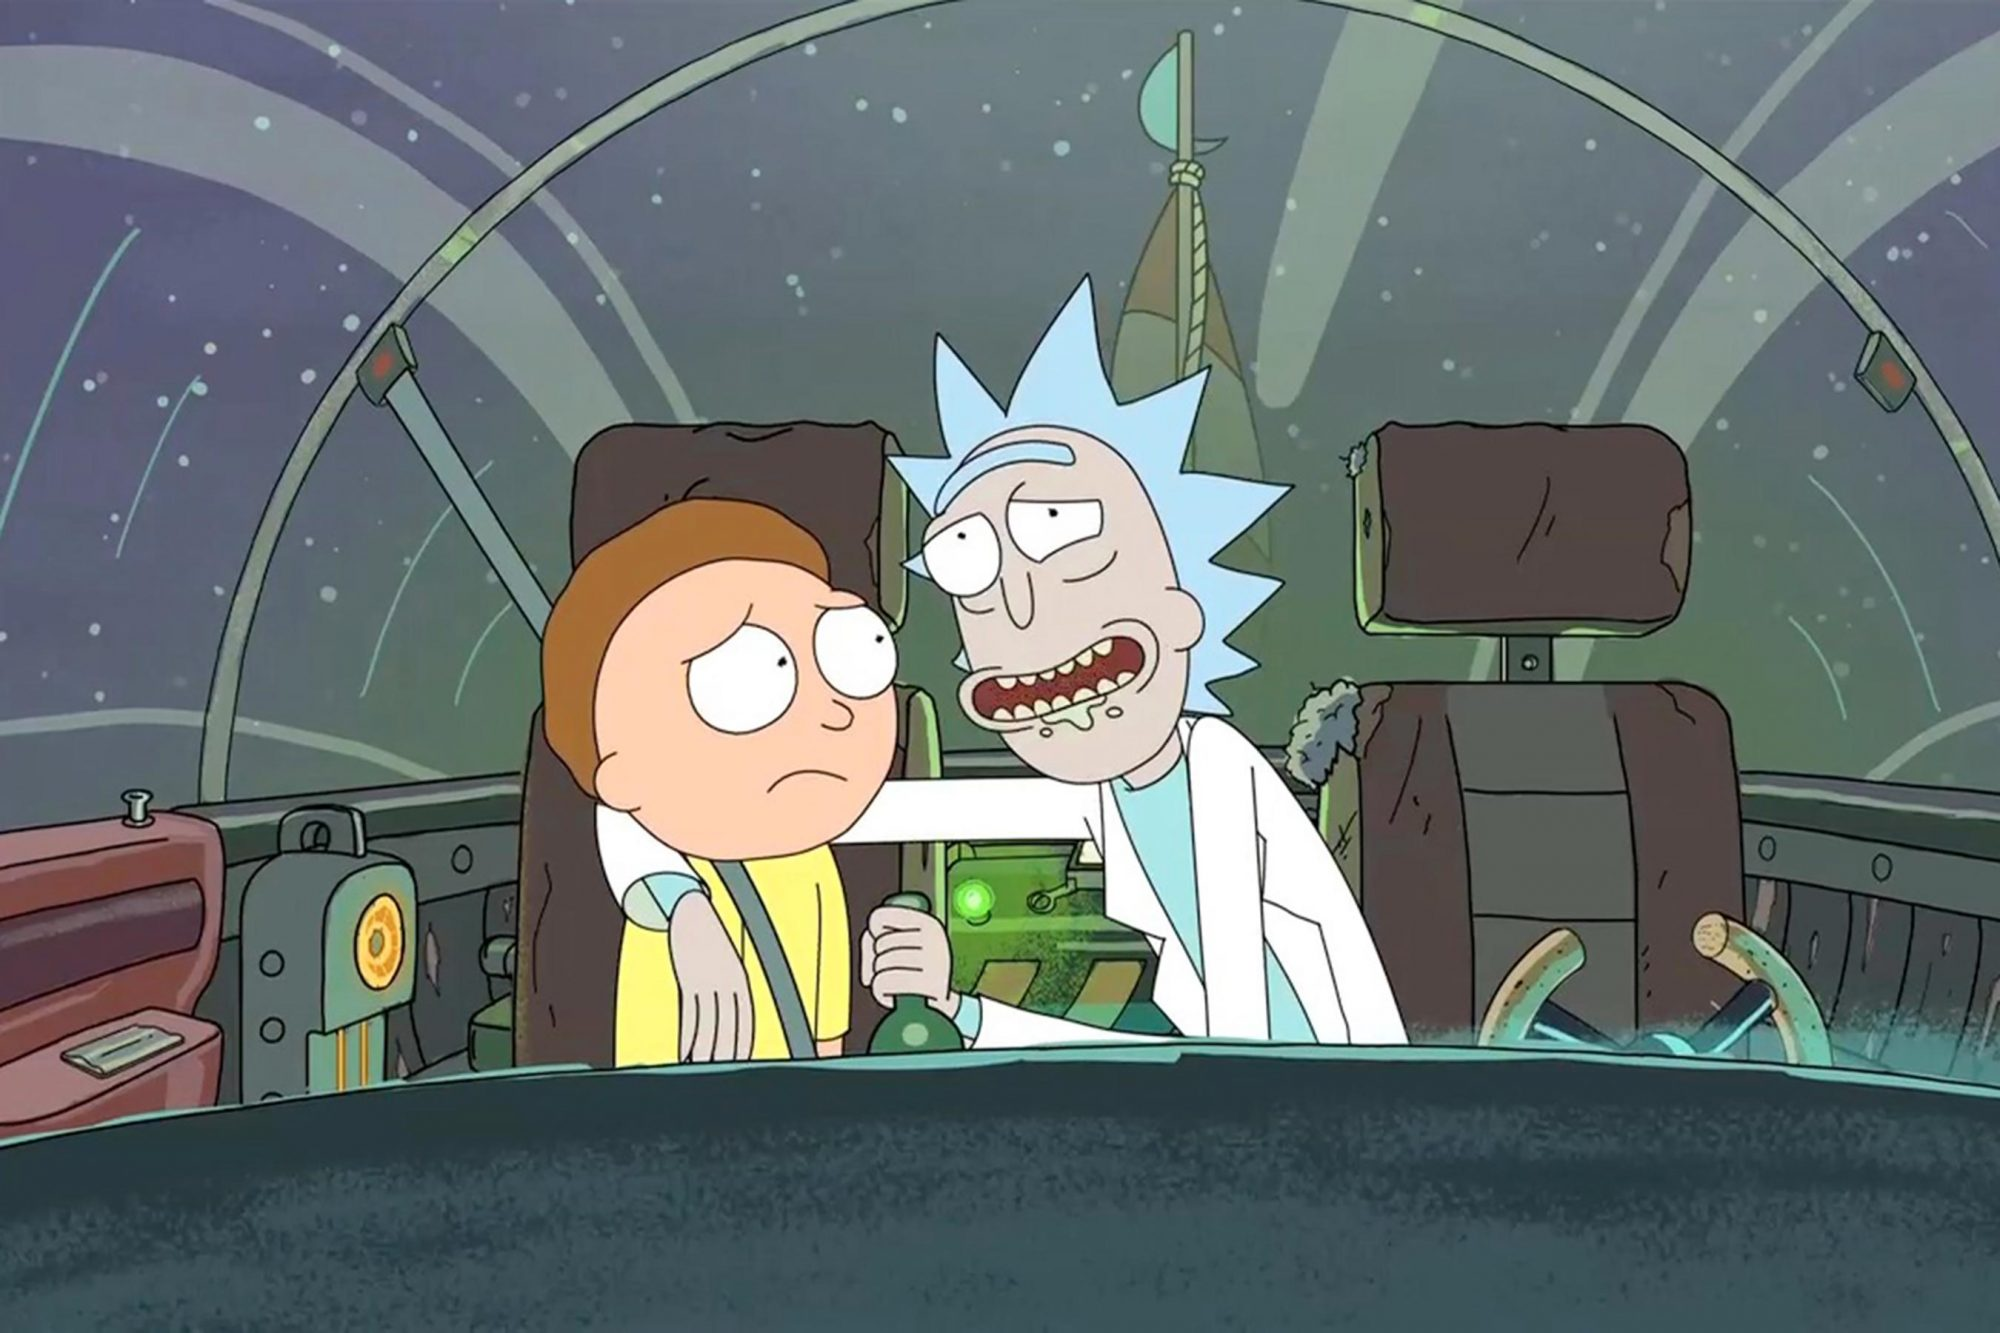 Rick and Morty CR: Adult Swim